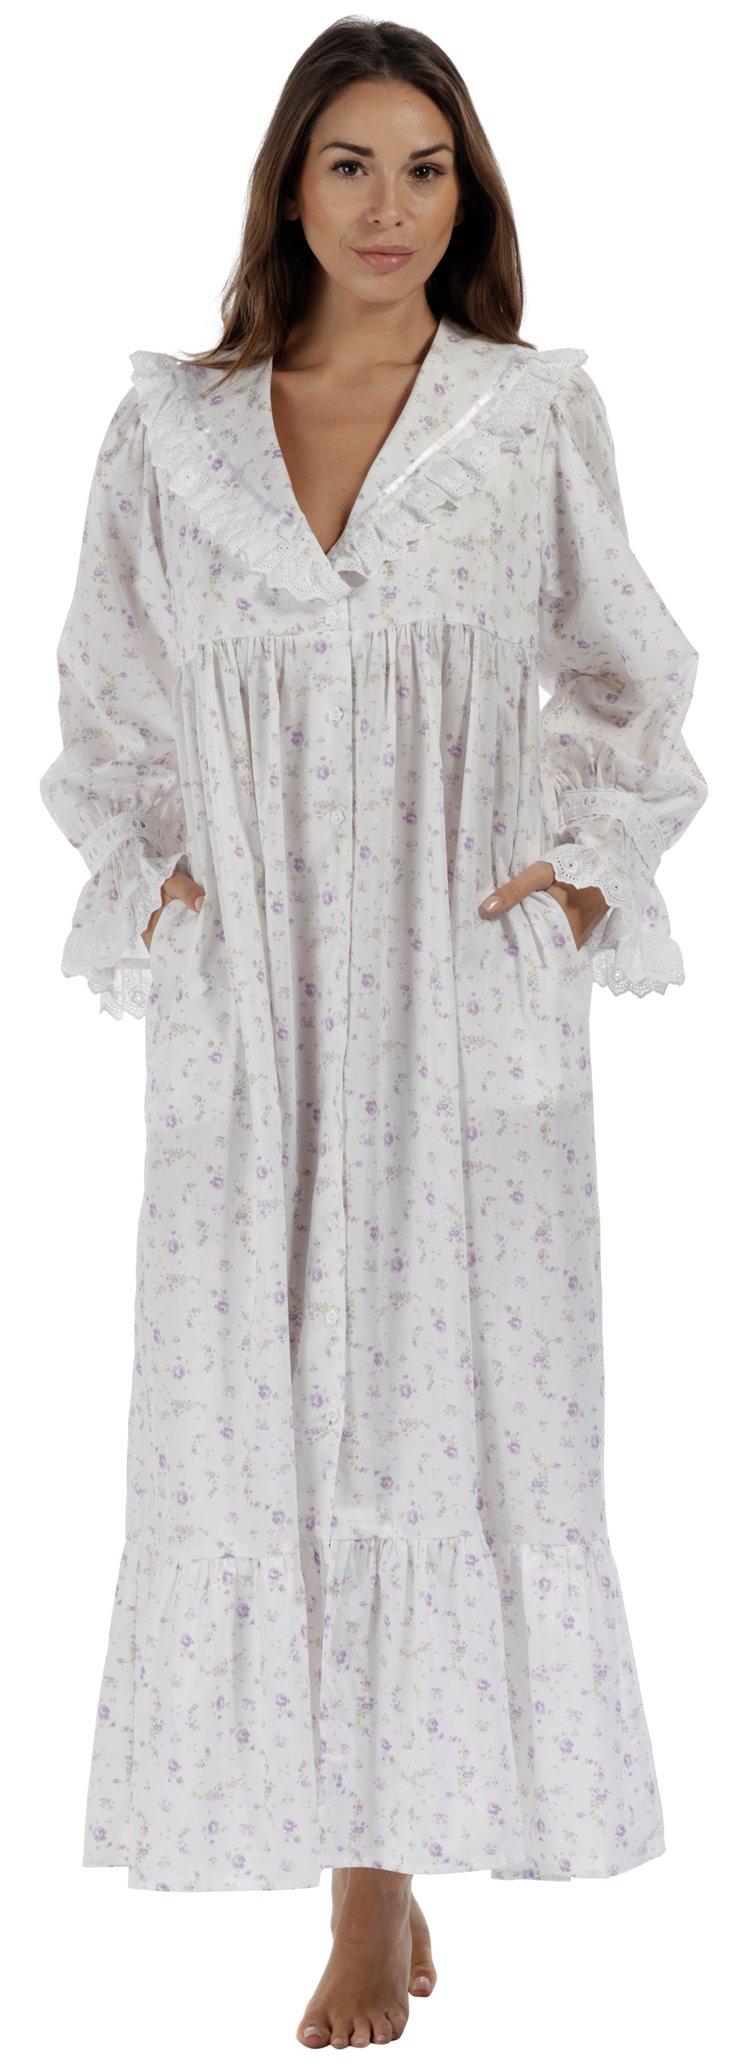 Womens Cotton Victorian Style Nightgown Sleep Dress